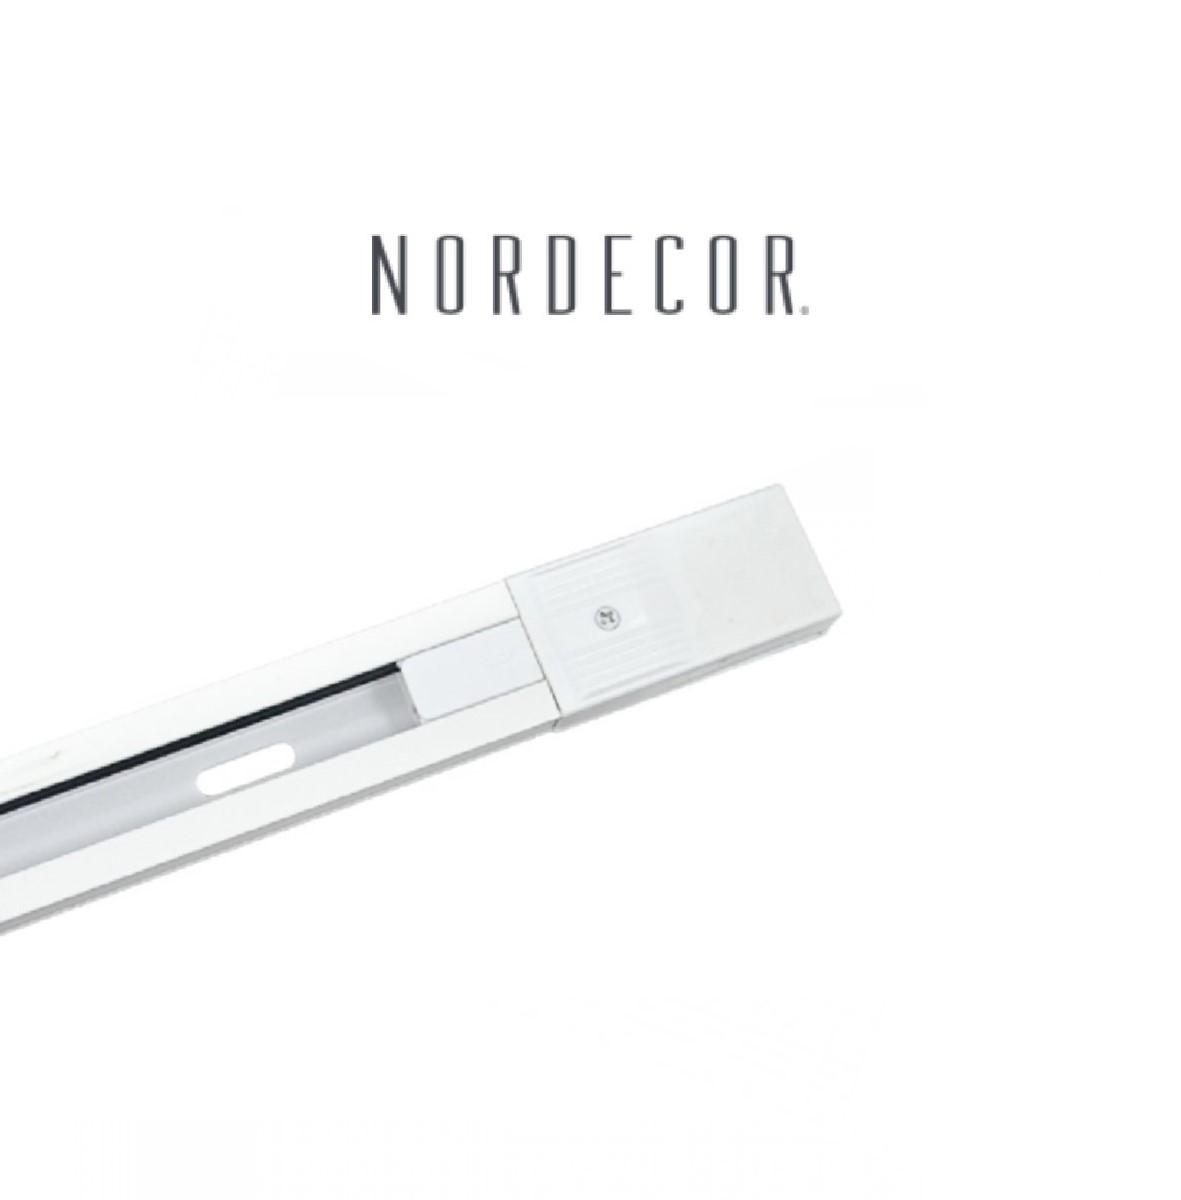 Trilho Eletrificado 1m Branco Para Spots Eletrificado Nordecor 6054